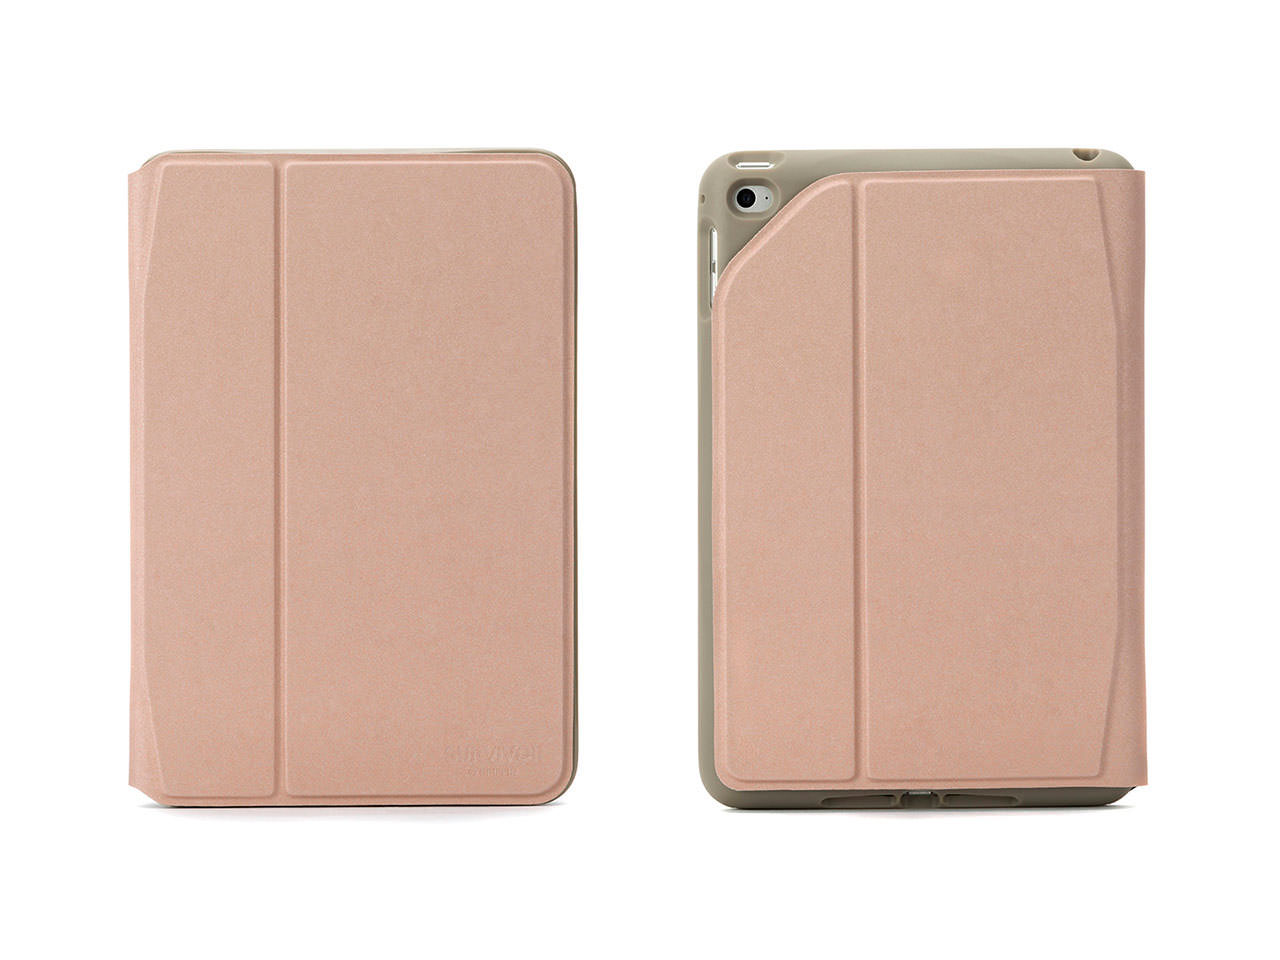 iPad mini 1/2/3 Protective Case